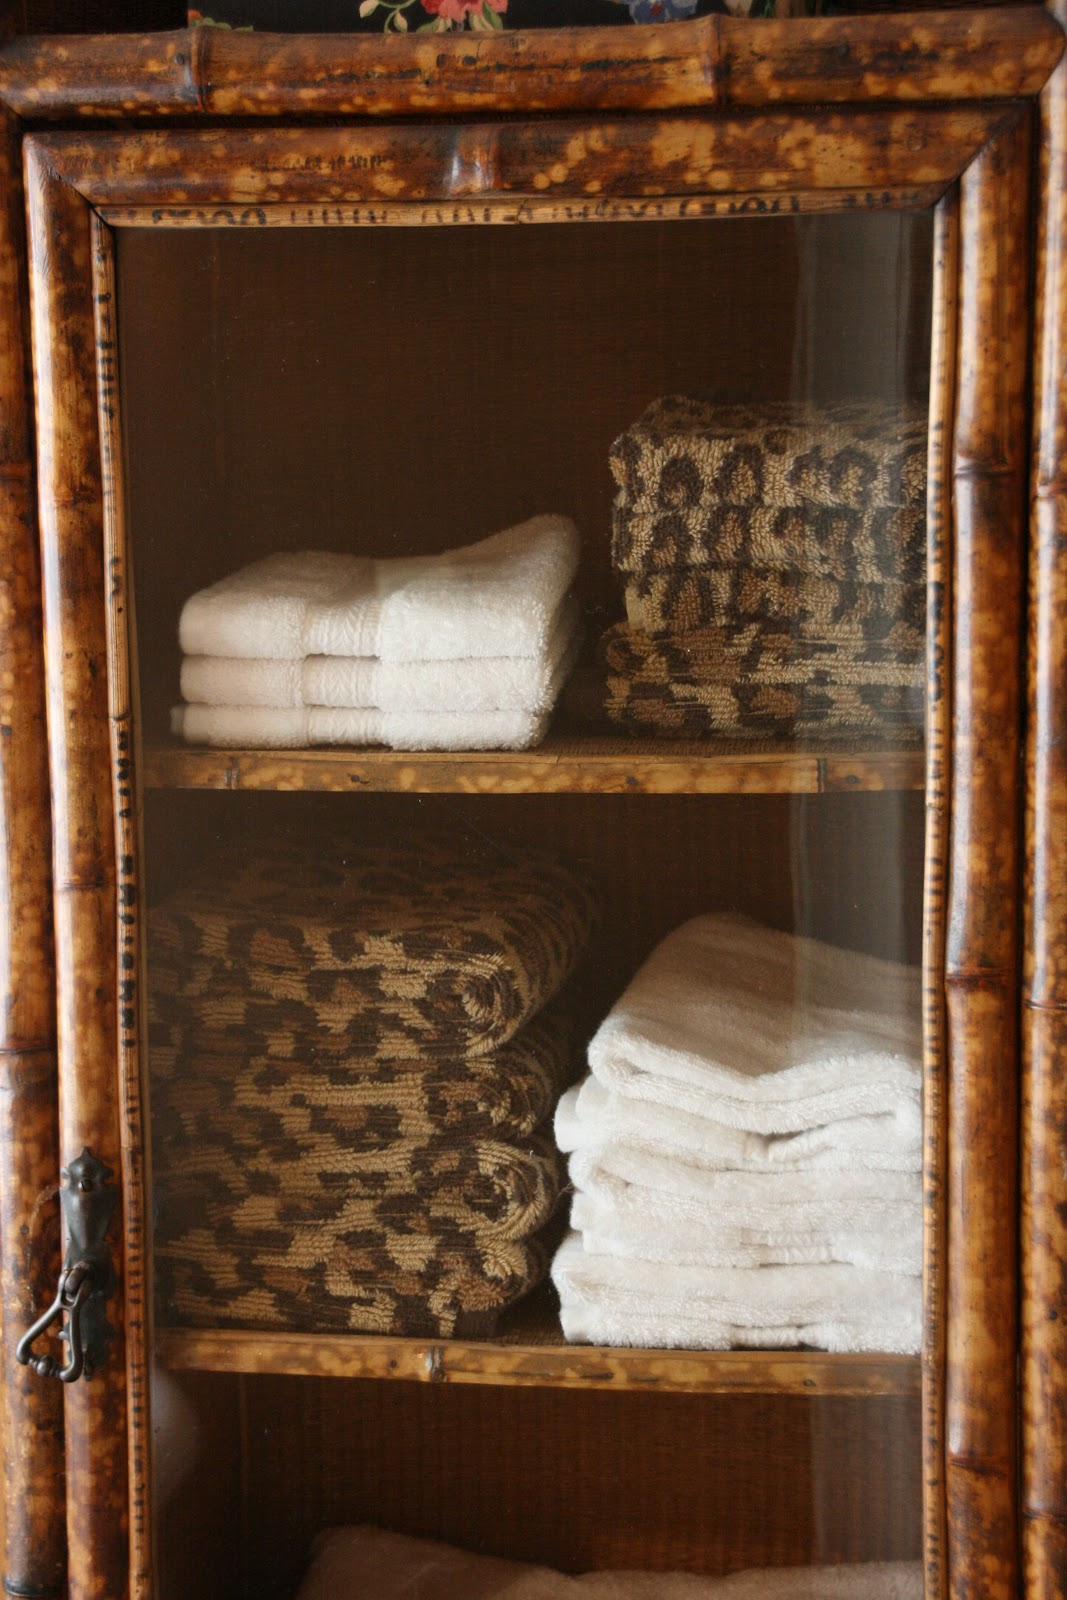 Vignette Design Furniture In The Bathroom A Luxury